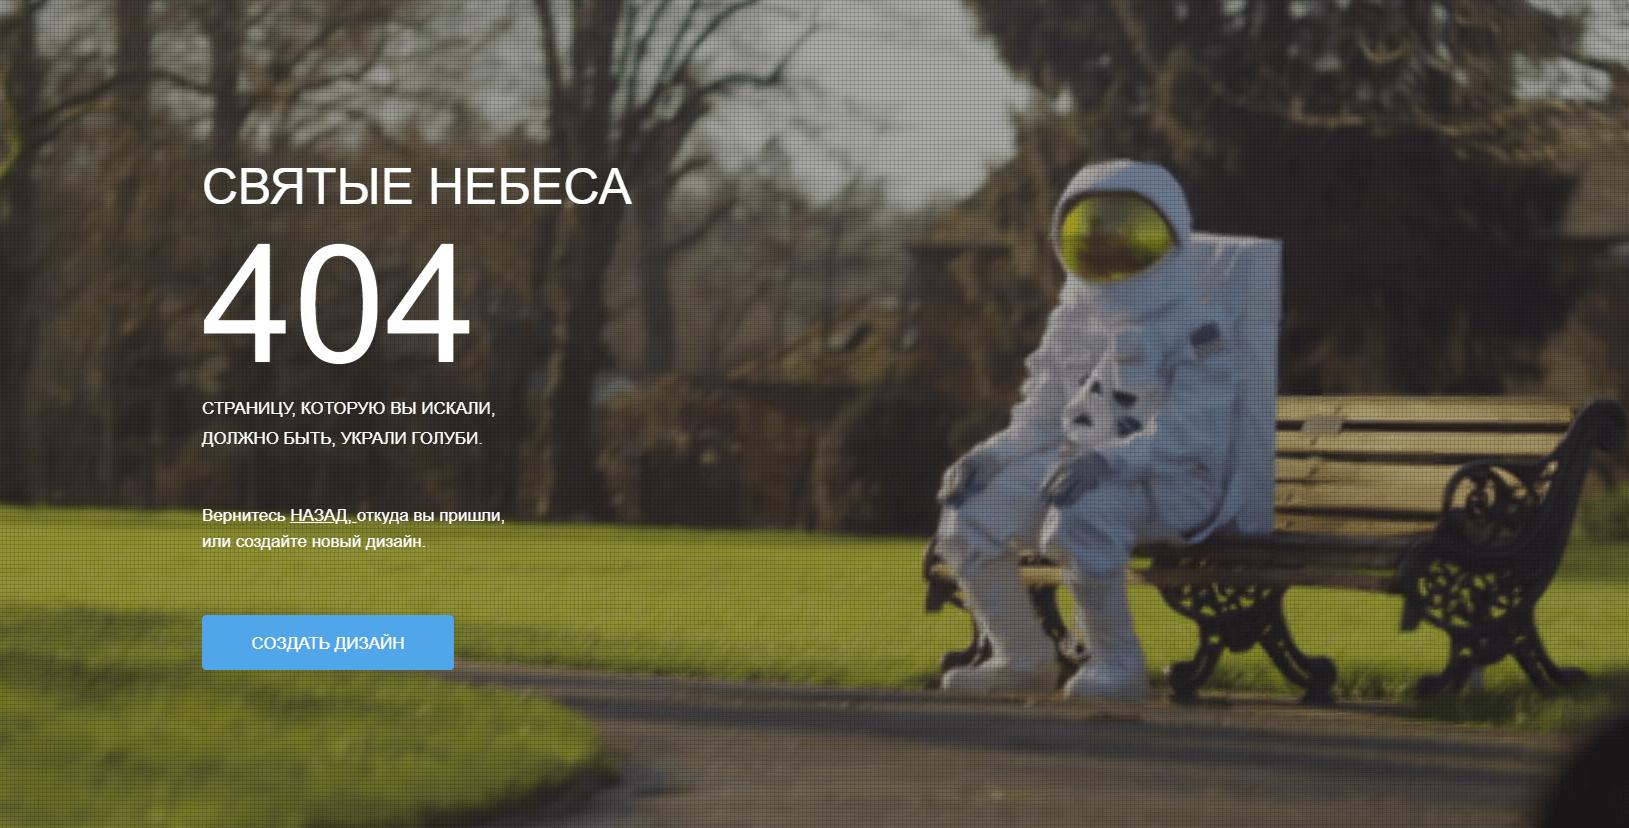 Подборка креативных страниц 404 ошибки